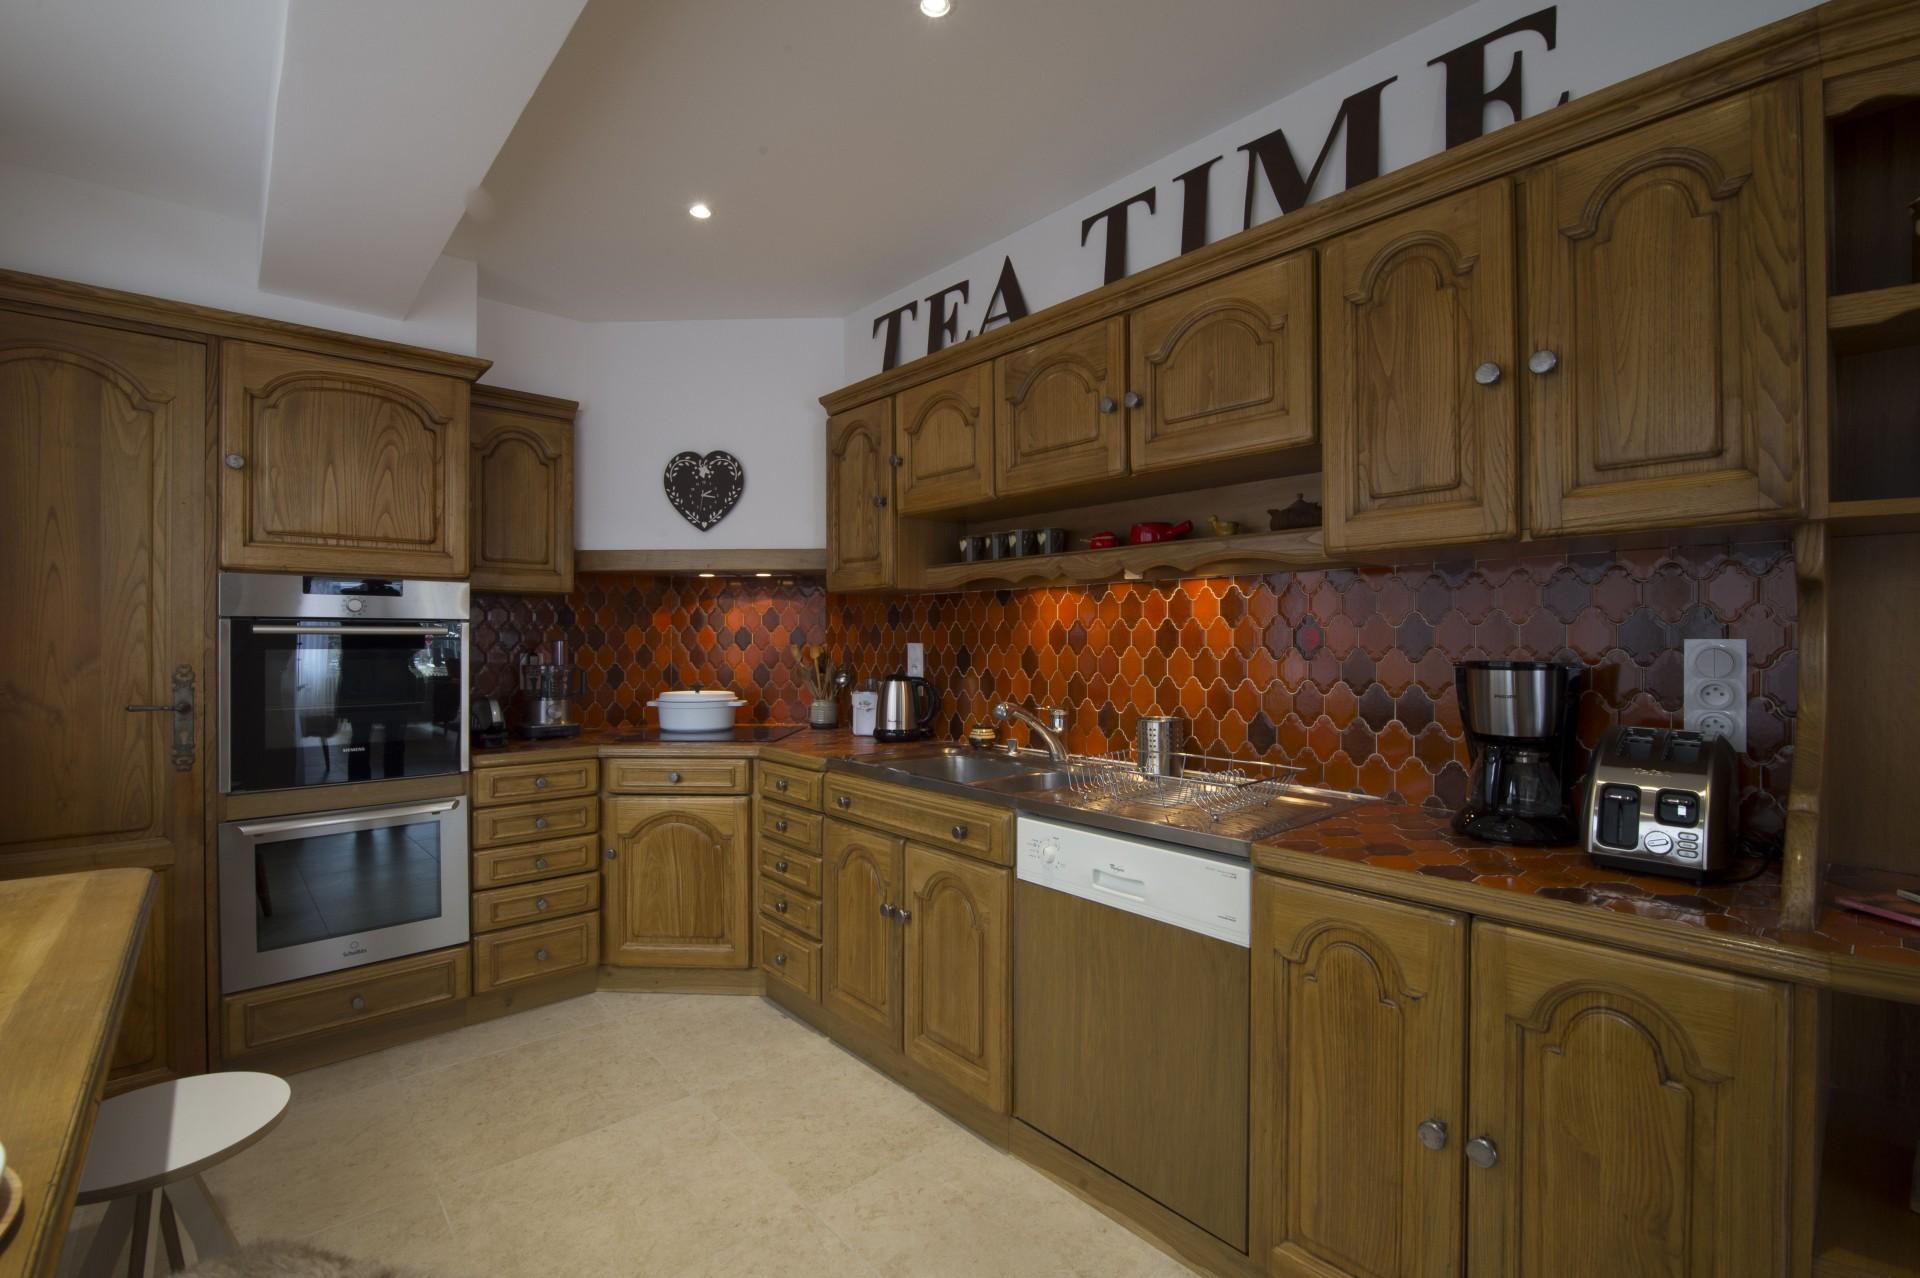 Courchevel 1850 Luxury Rental Appartment Taramite Kitchen 2